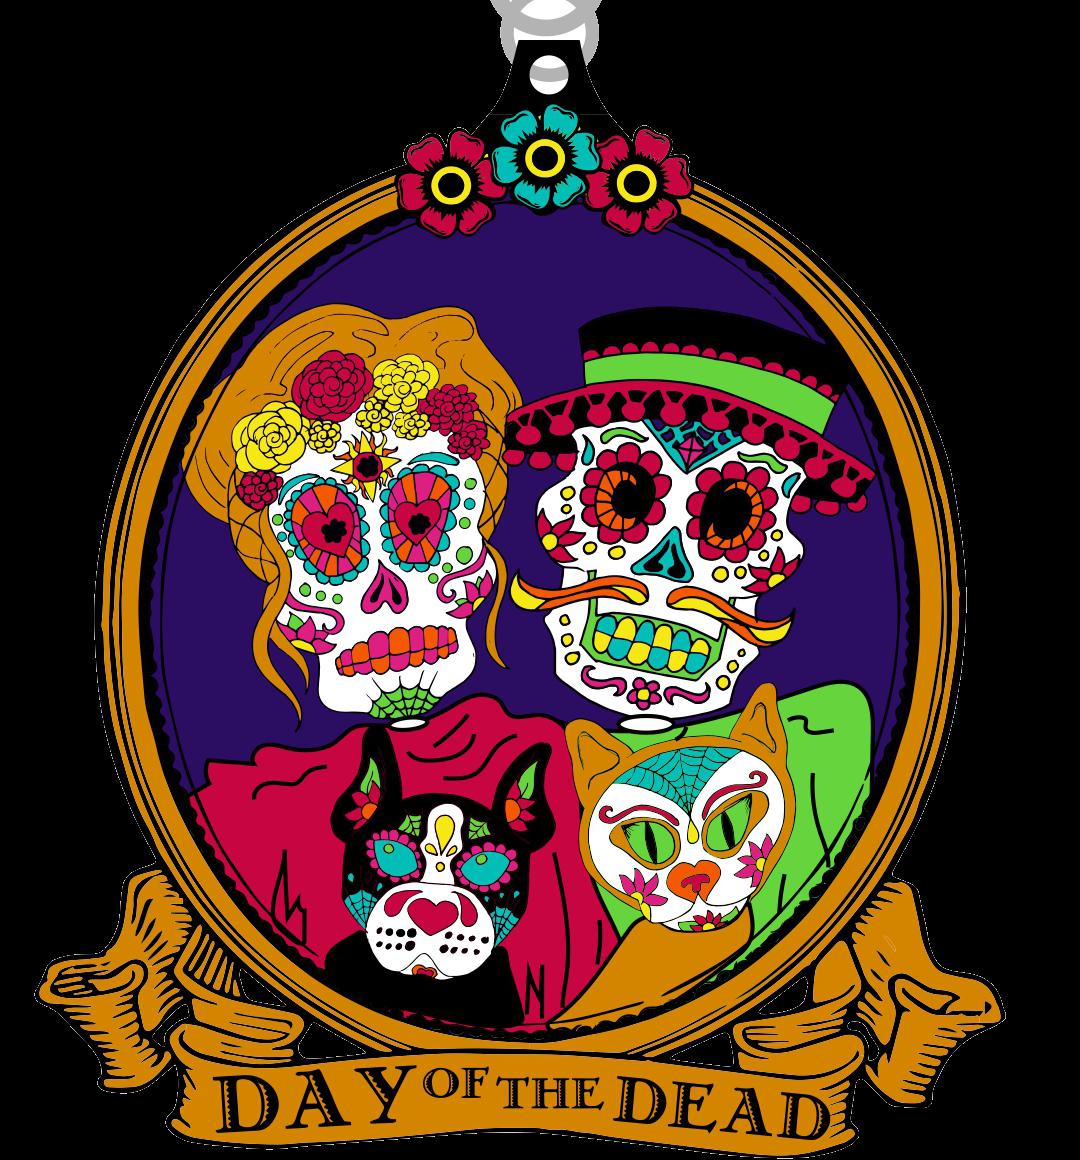 Day of the dead clipart clip 2019 Day of the Dead 1 Mile, 5K, 10K, 13.1, 26.2 - Atlanta clip